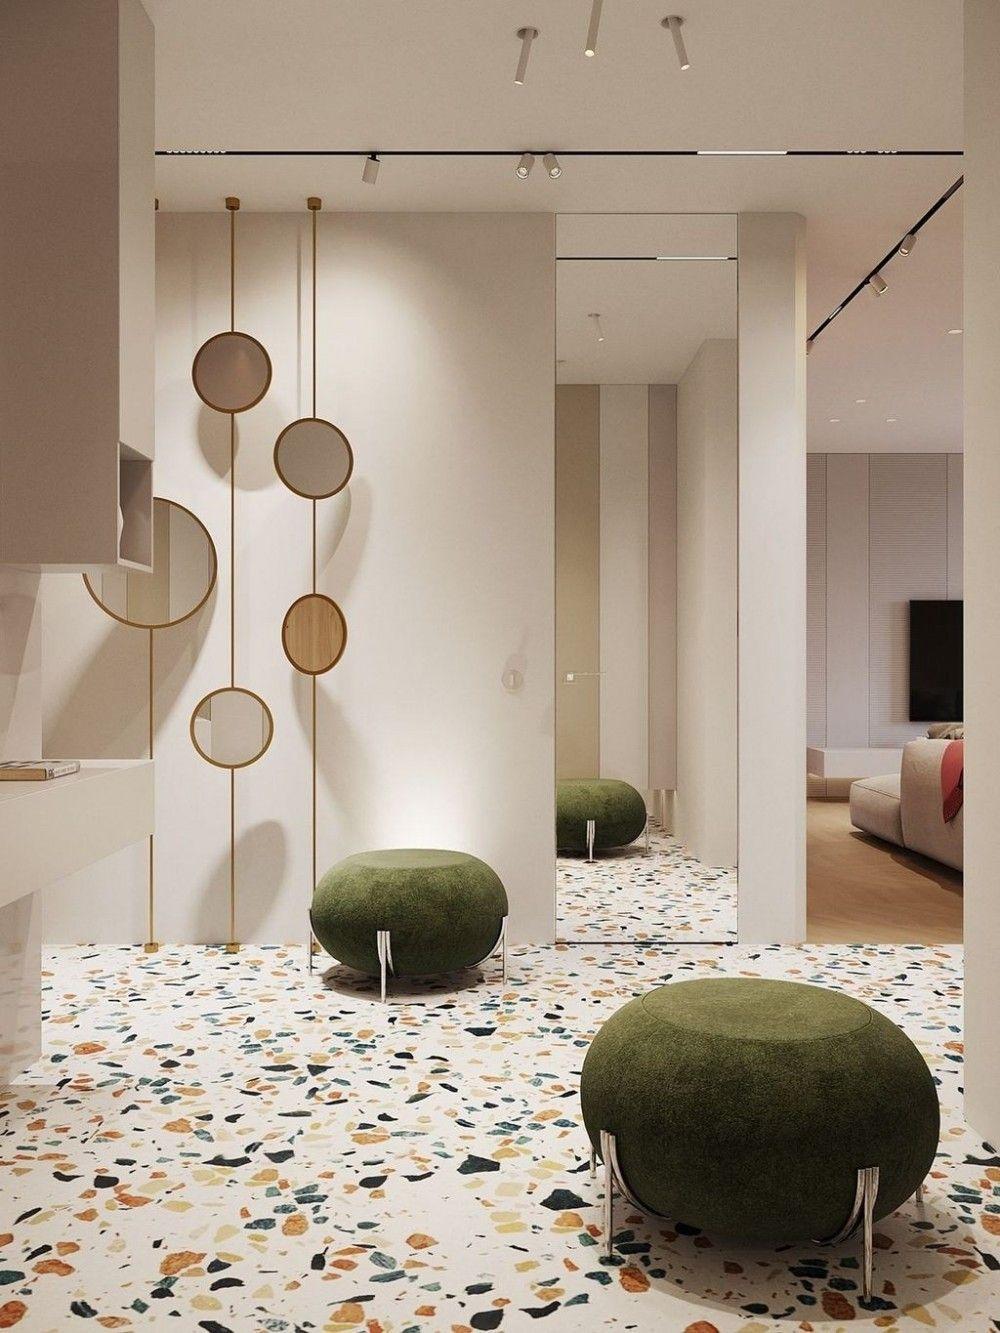 20 Idees De Design D Interieur D Appartement Moderne Idees De